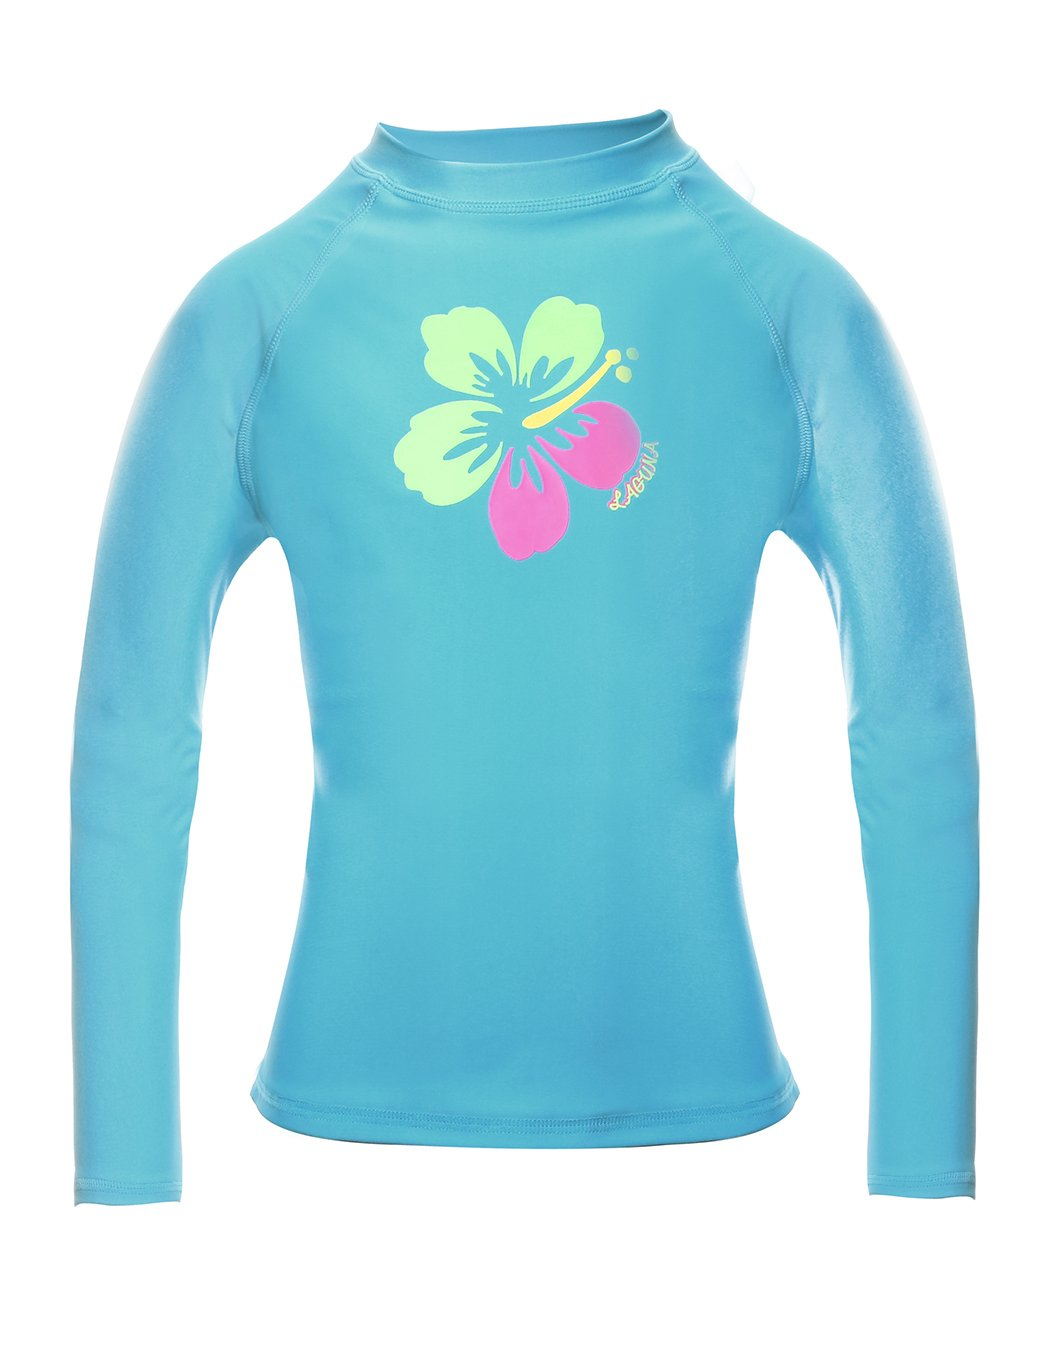 iDrawl Long Sleeve Rash Guard High Neck Surf Swim Shirt UPF 50+ Sun Protection Basic Kids Rashguard Shirt